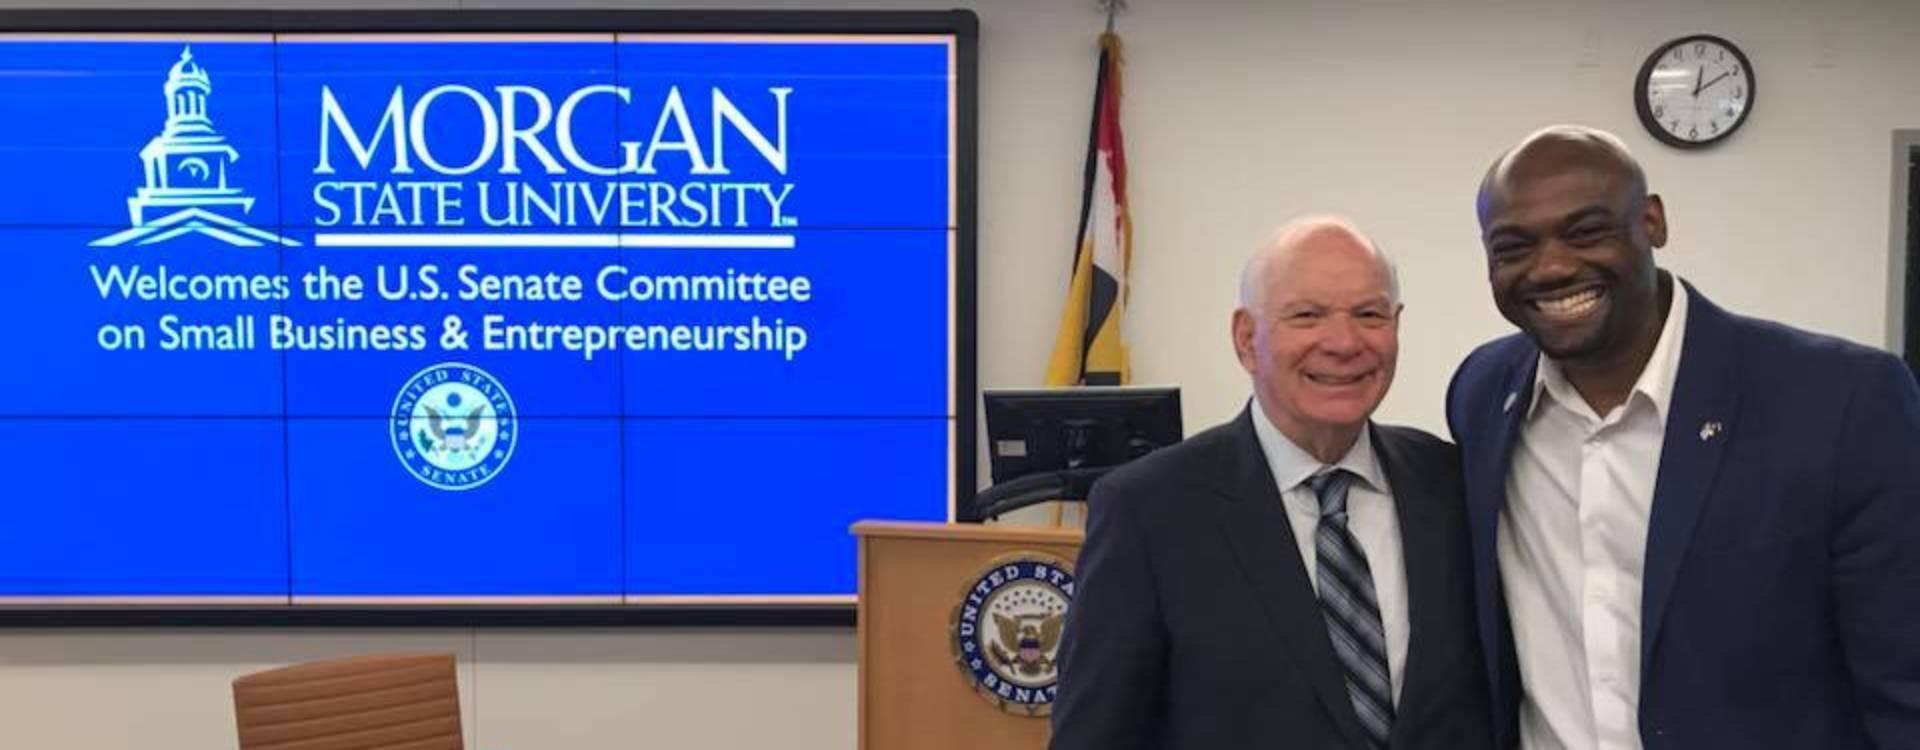 Small Business Leadership